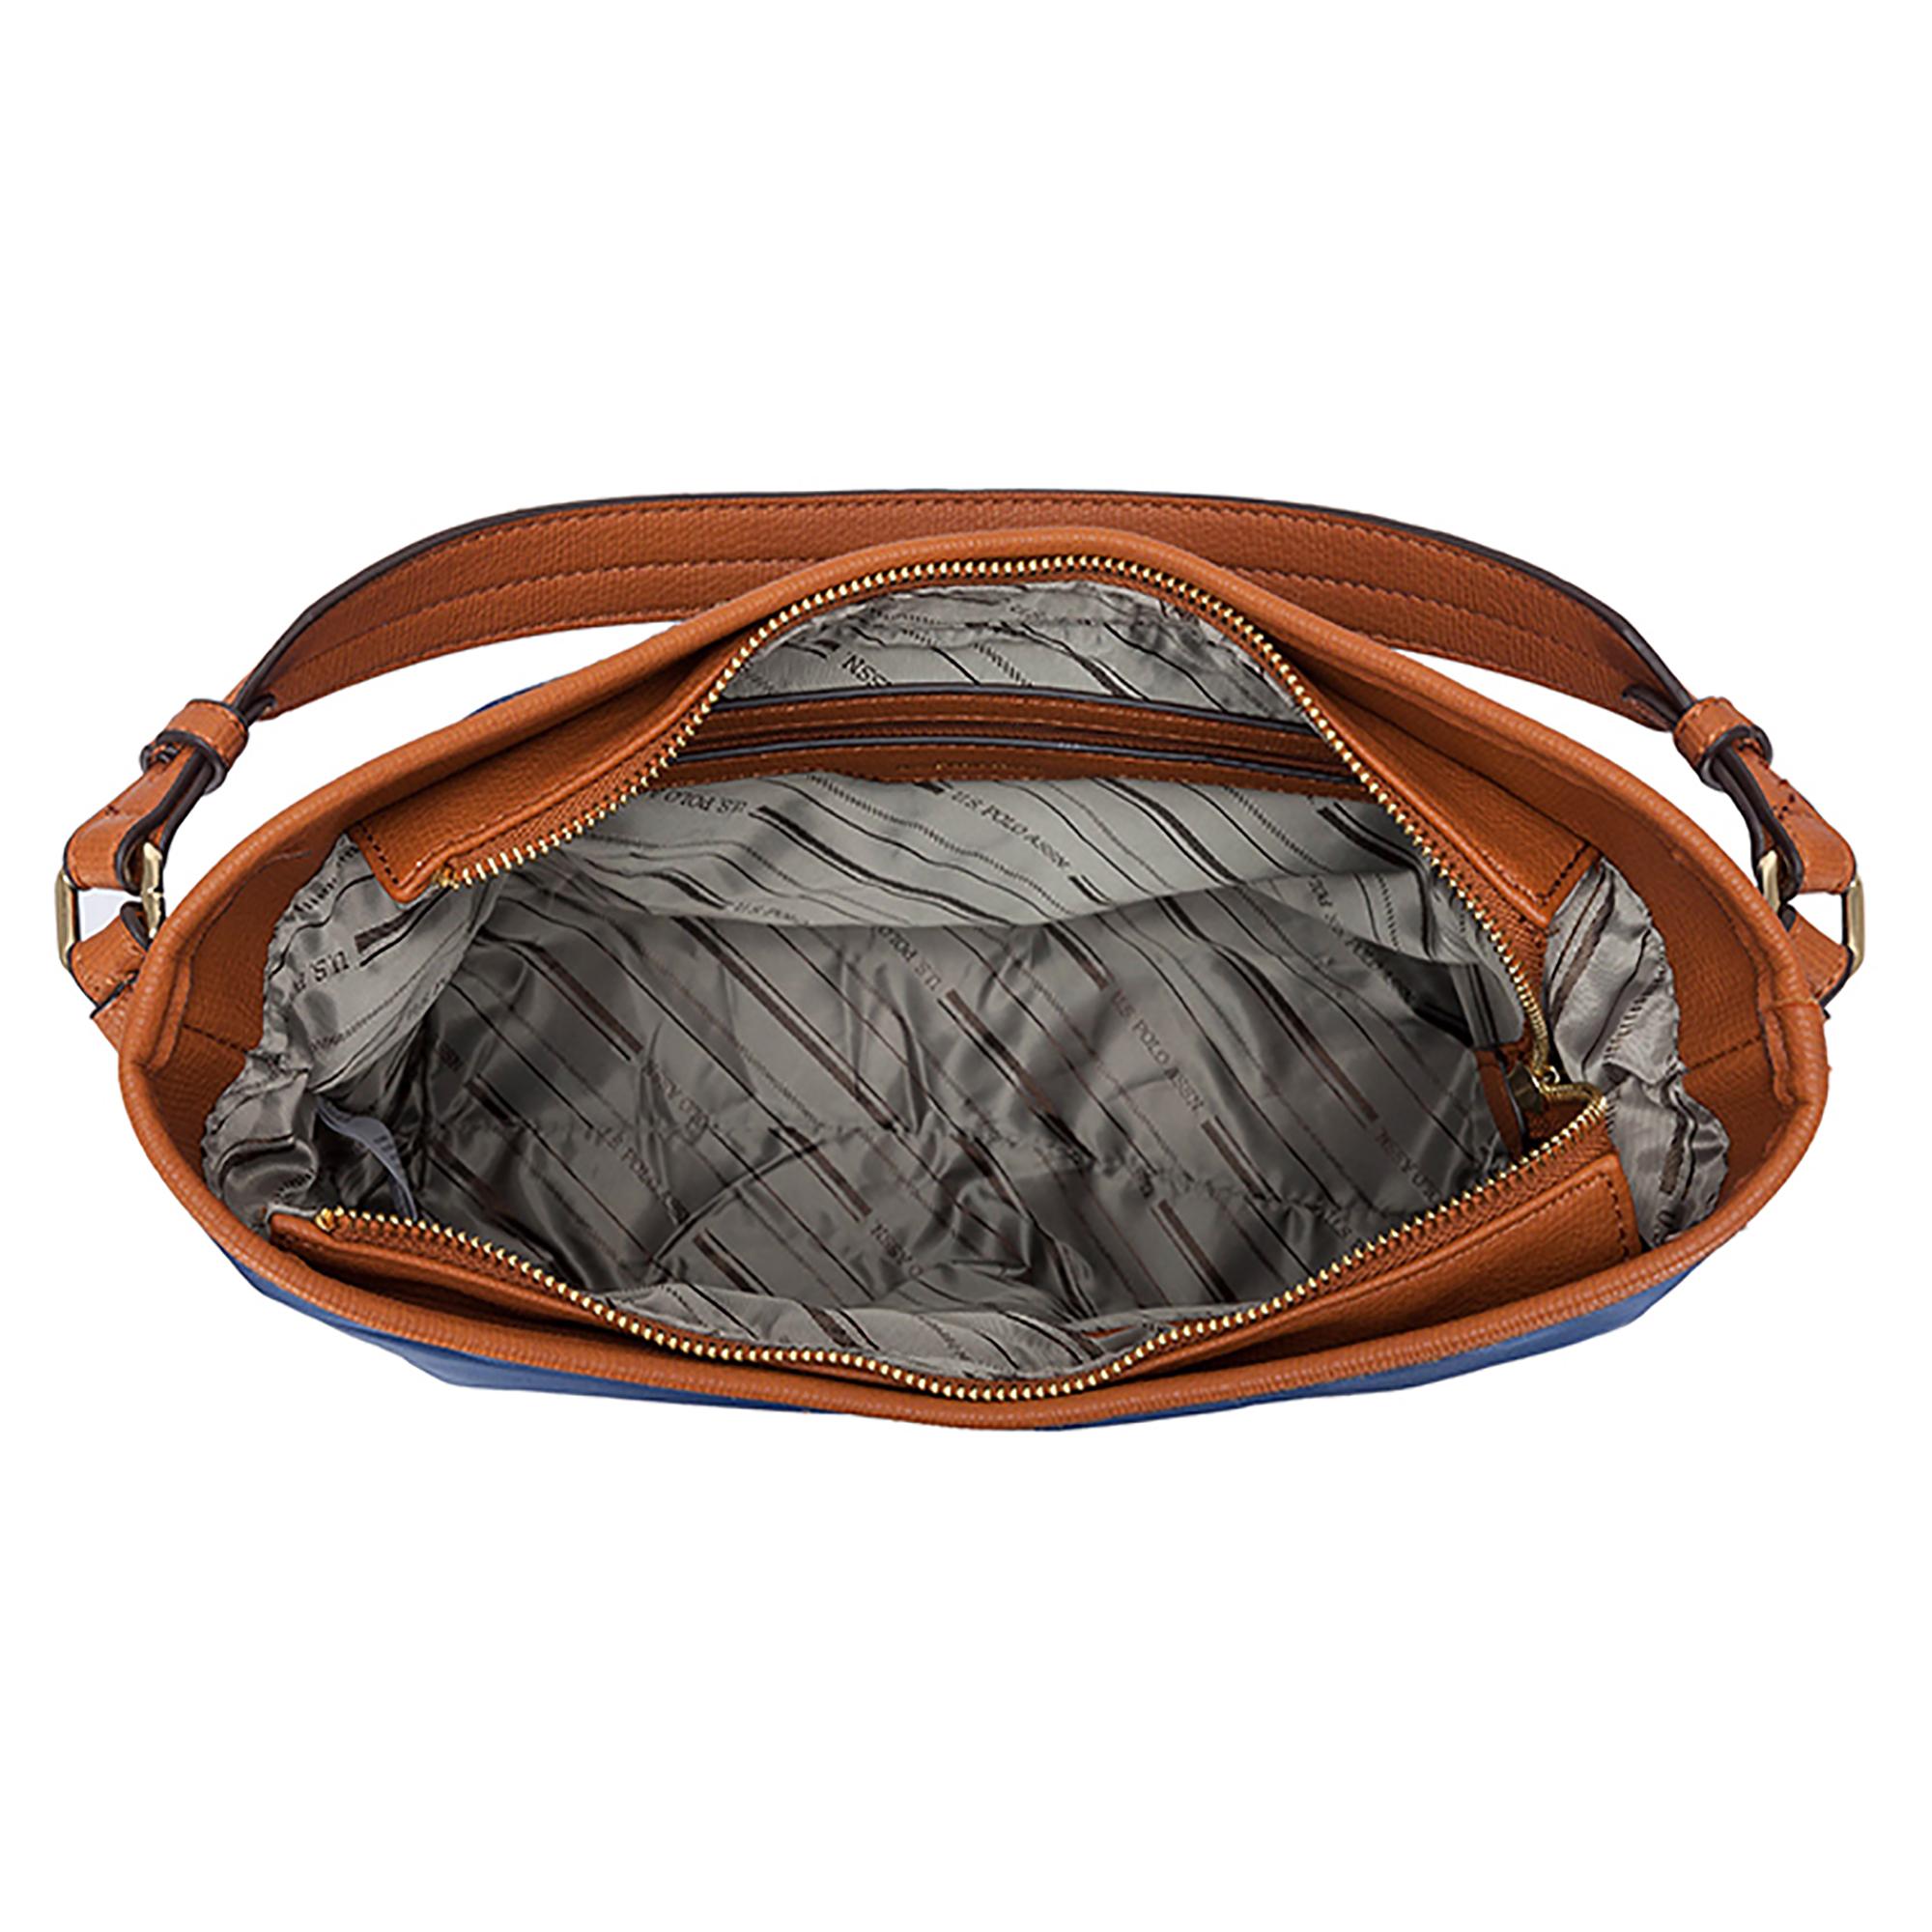 NEW-US-Polo-Assn-Houston-Hobo-Zip-Top-Handbag-Casual-Fashion-Nylon-Single-Strap thumbnail 9